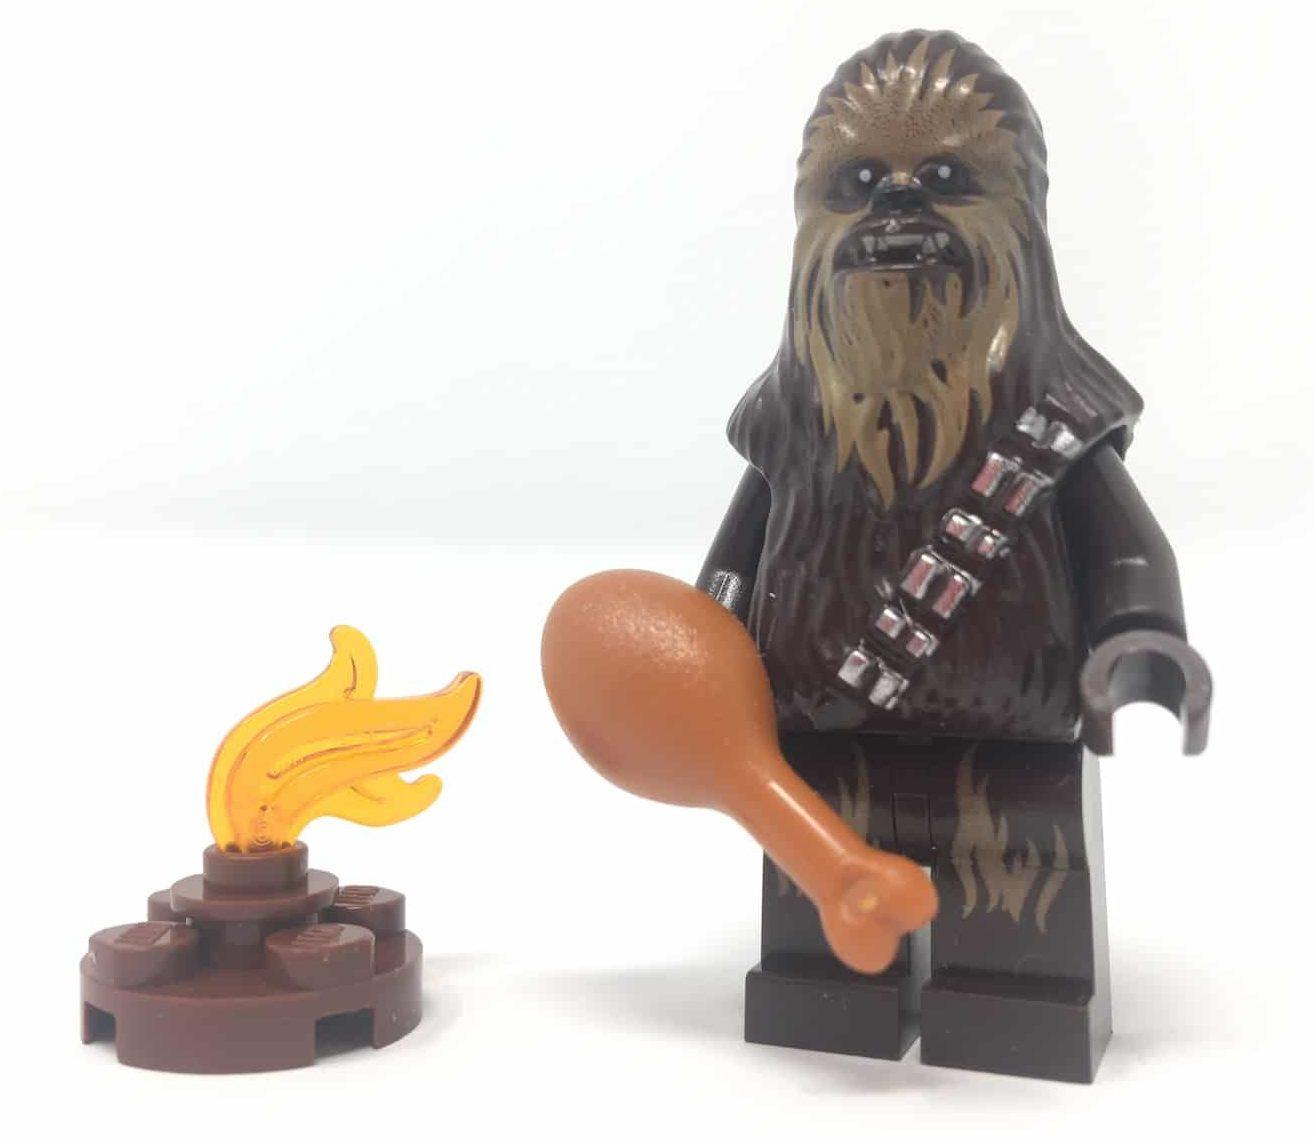 LEGO 75245 Star Wars Adventskalender 2019 Tür 7